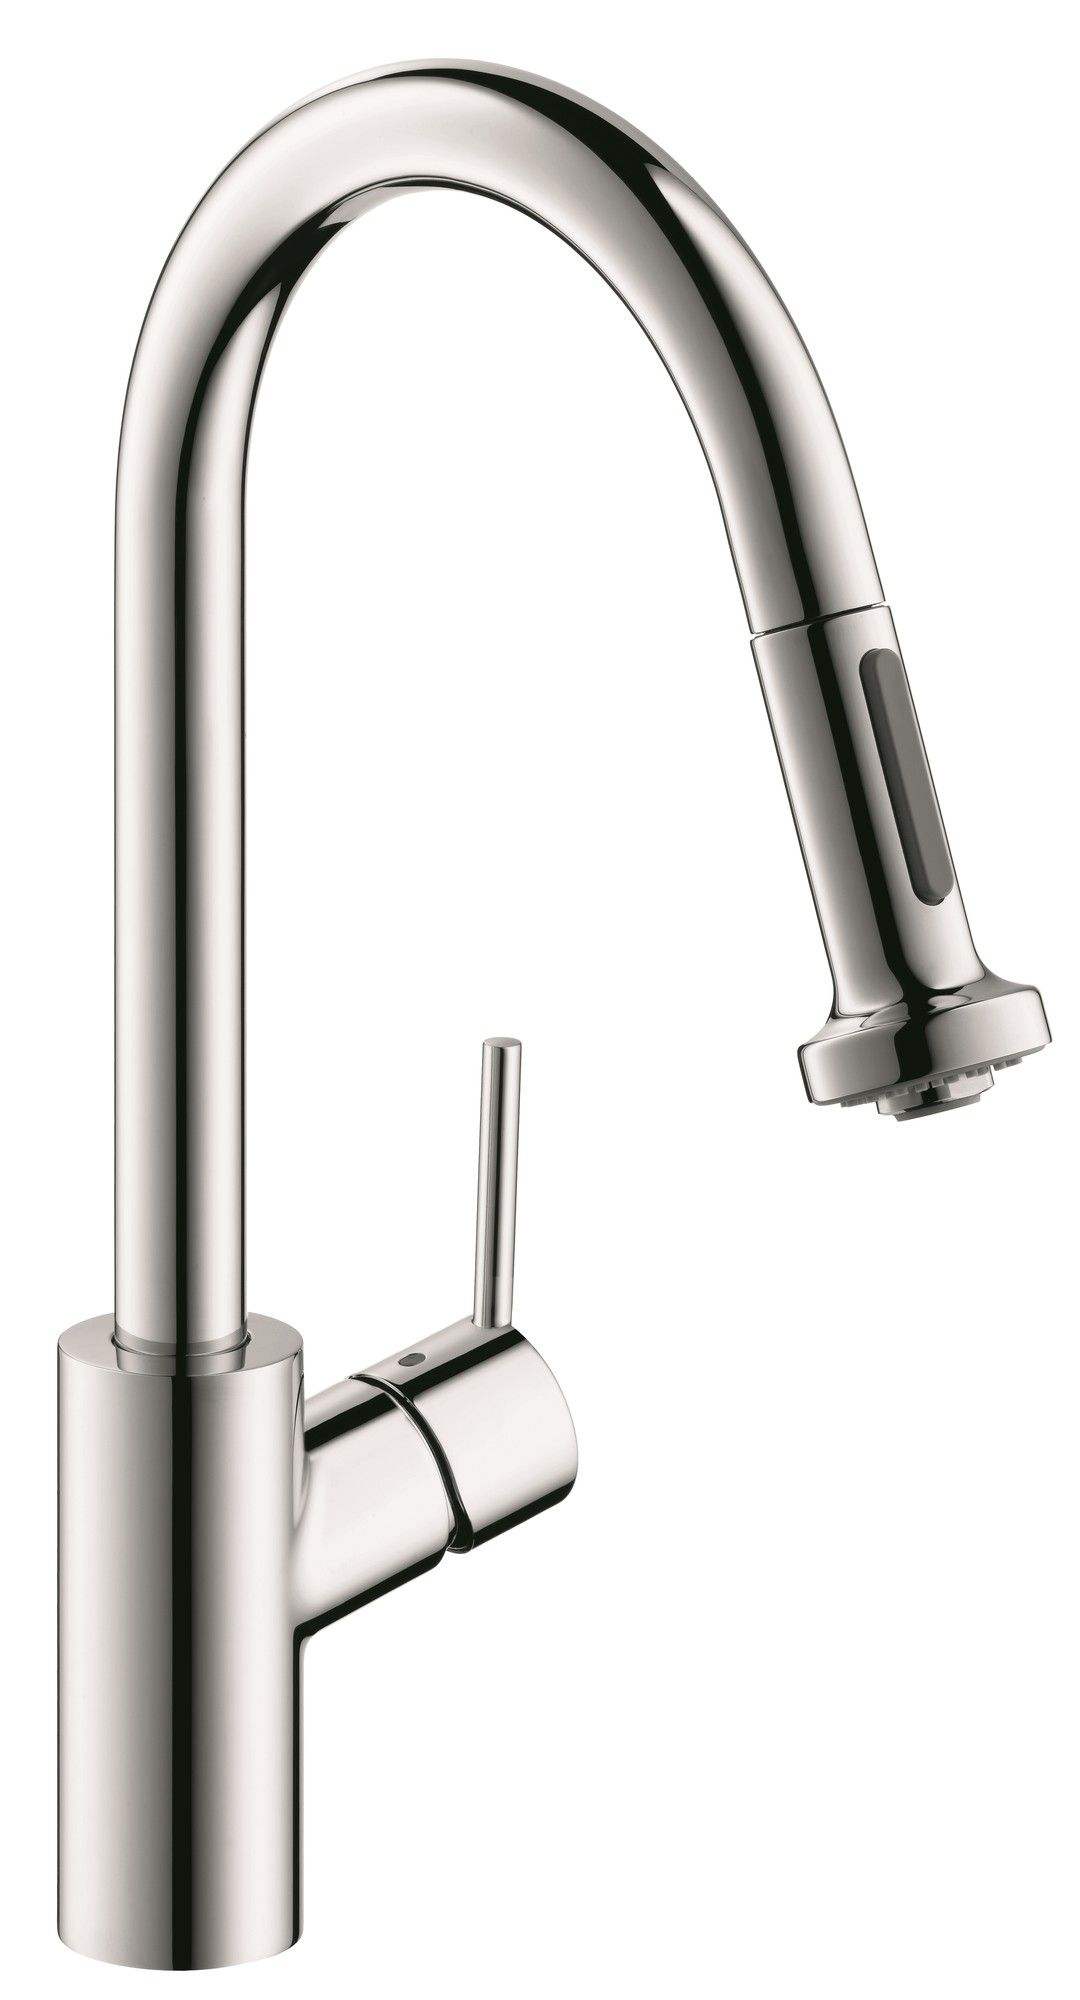 Pin by TASSINARI RUBINETTERIE SRL on Kitchen Faucets - RUBINETTERIA ...